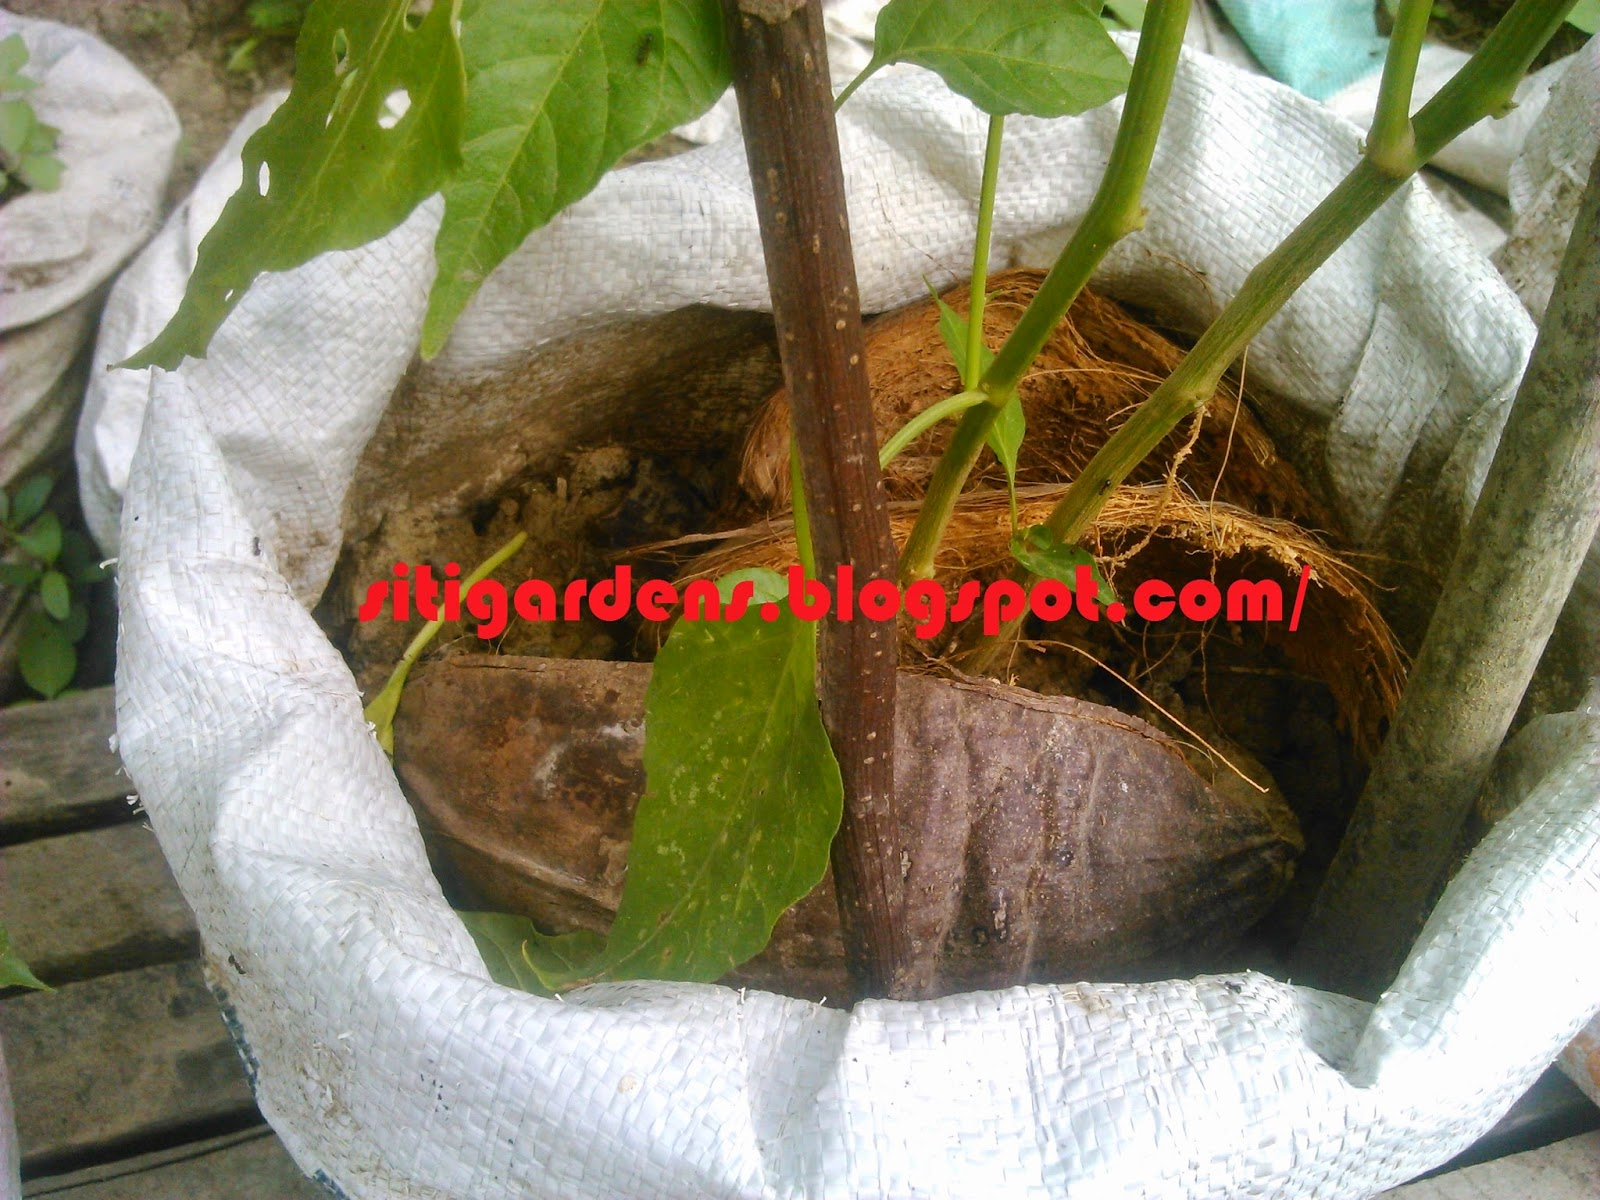 Fungsi Sabut Kelapa dalam Budidaya Cabe dalam Karung